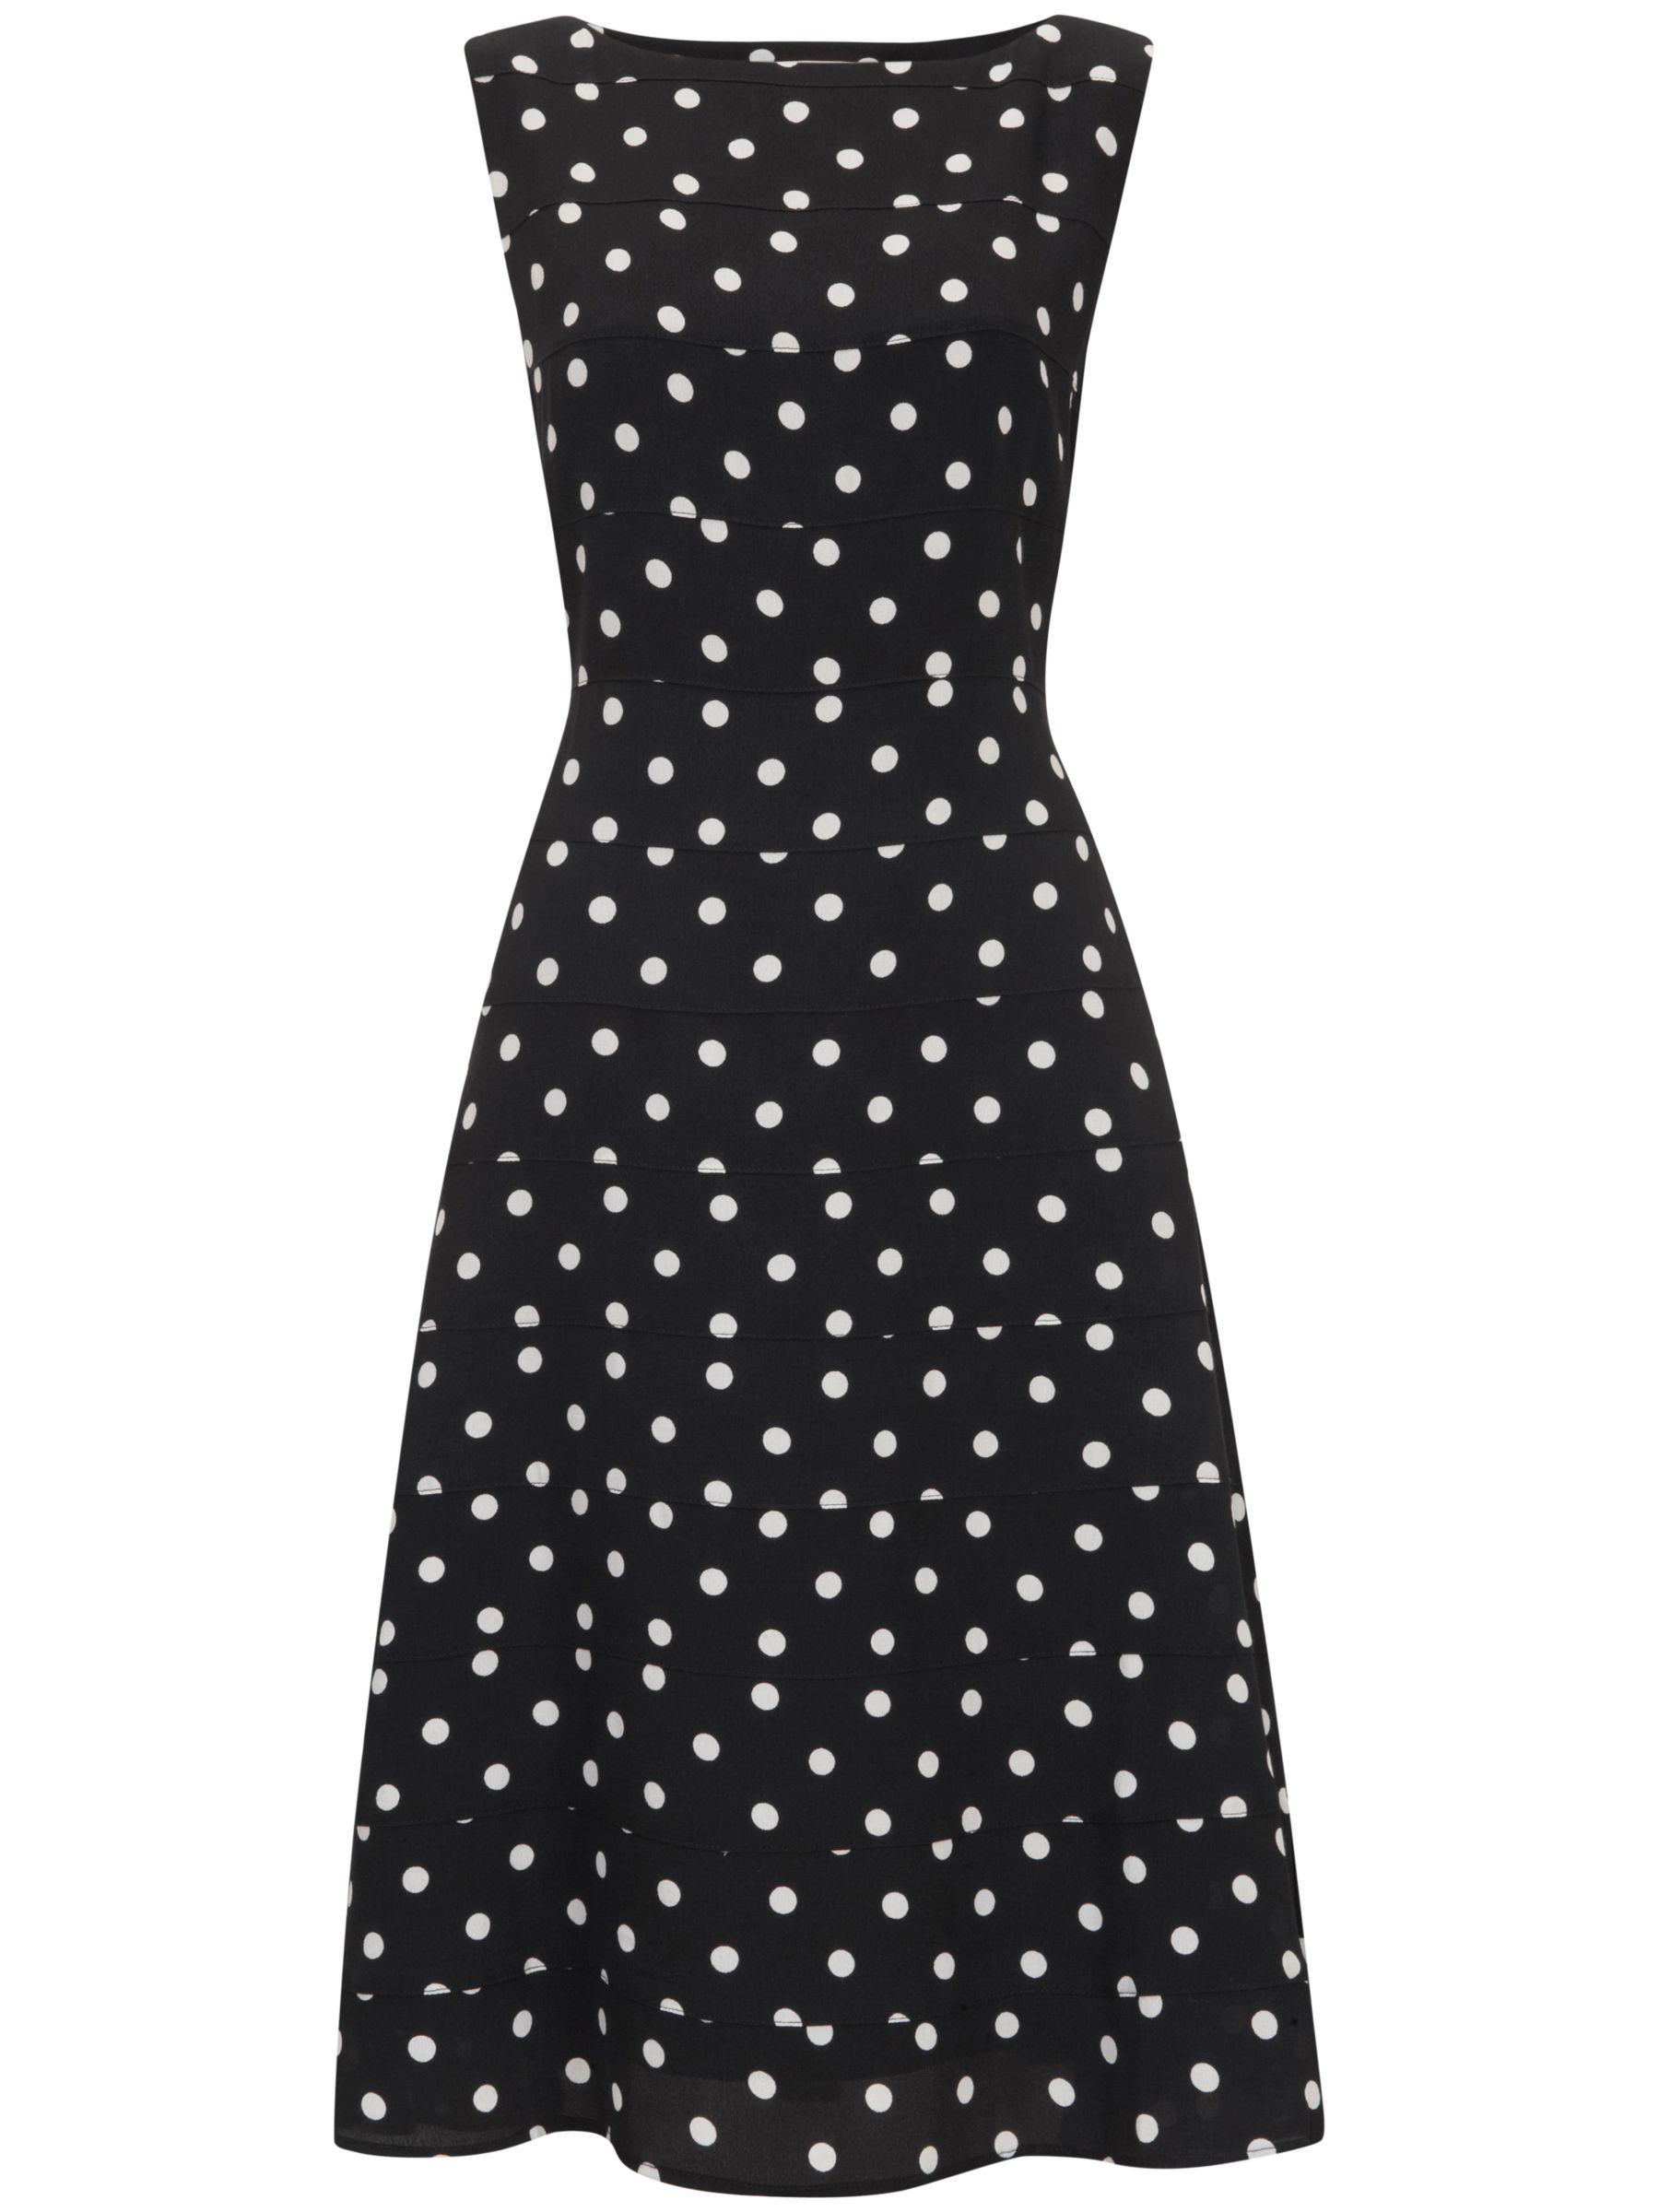 Havren Fit and Flare Polka Dot Dress, Multi